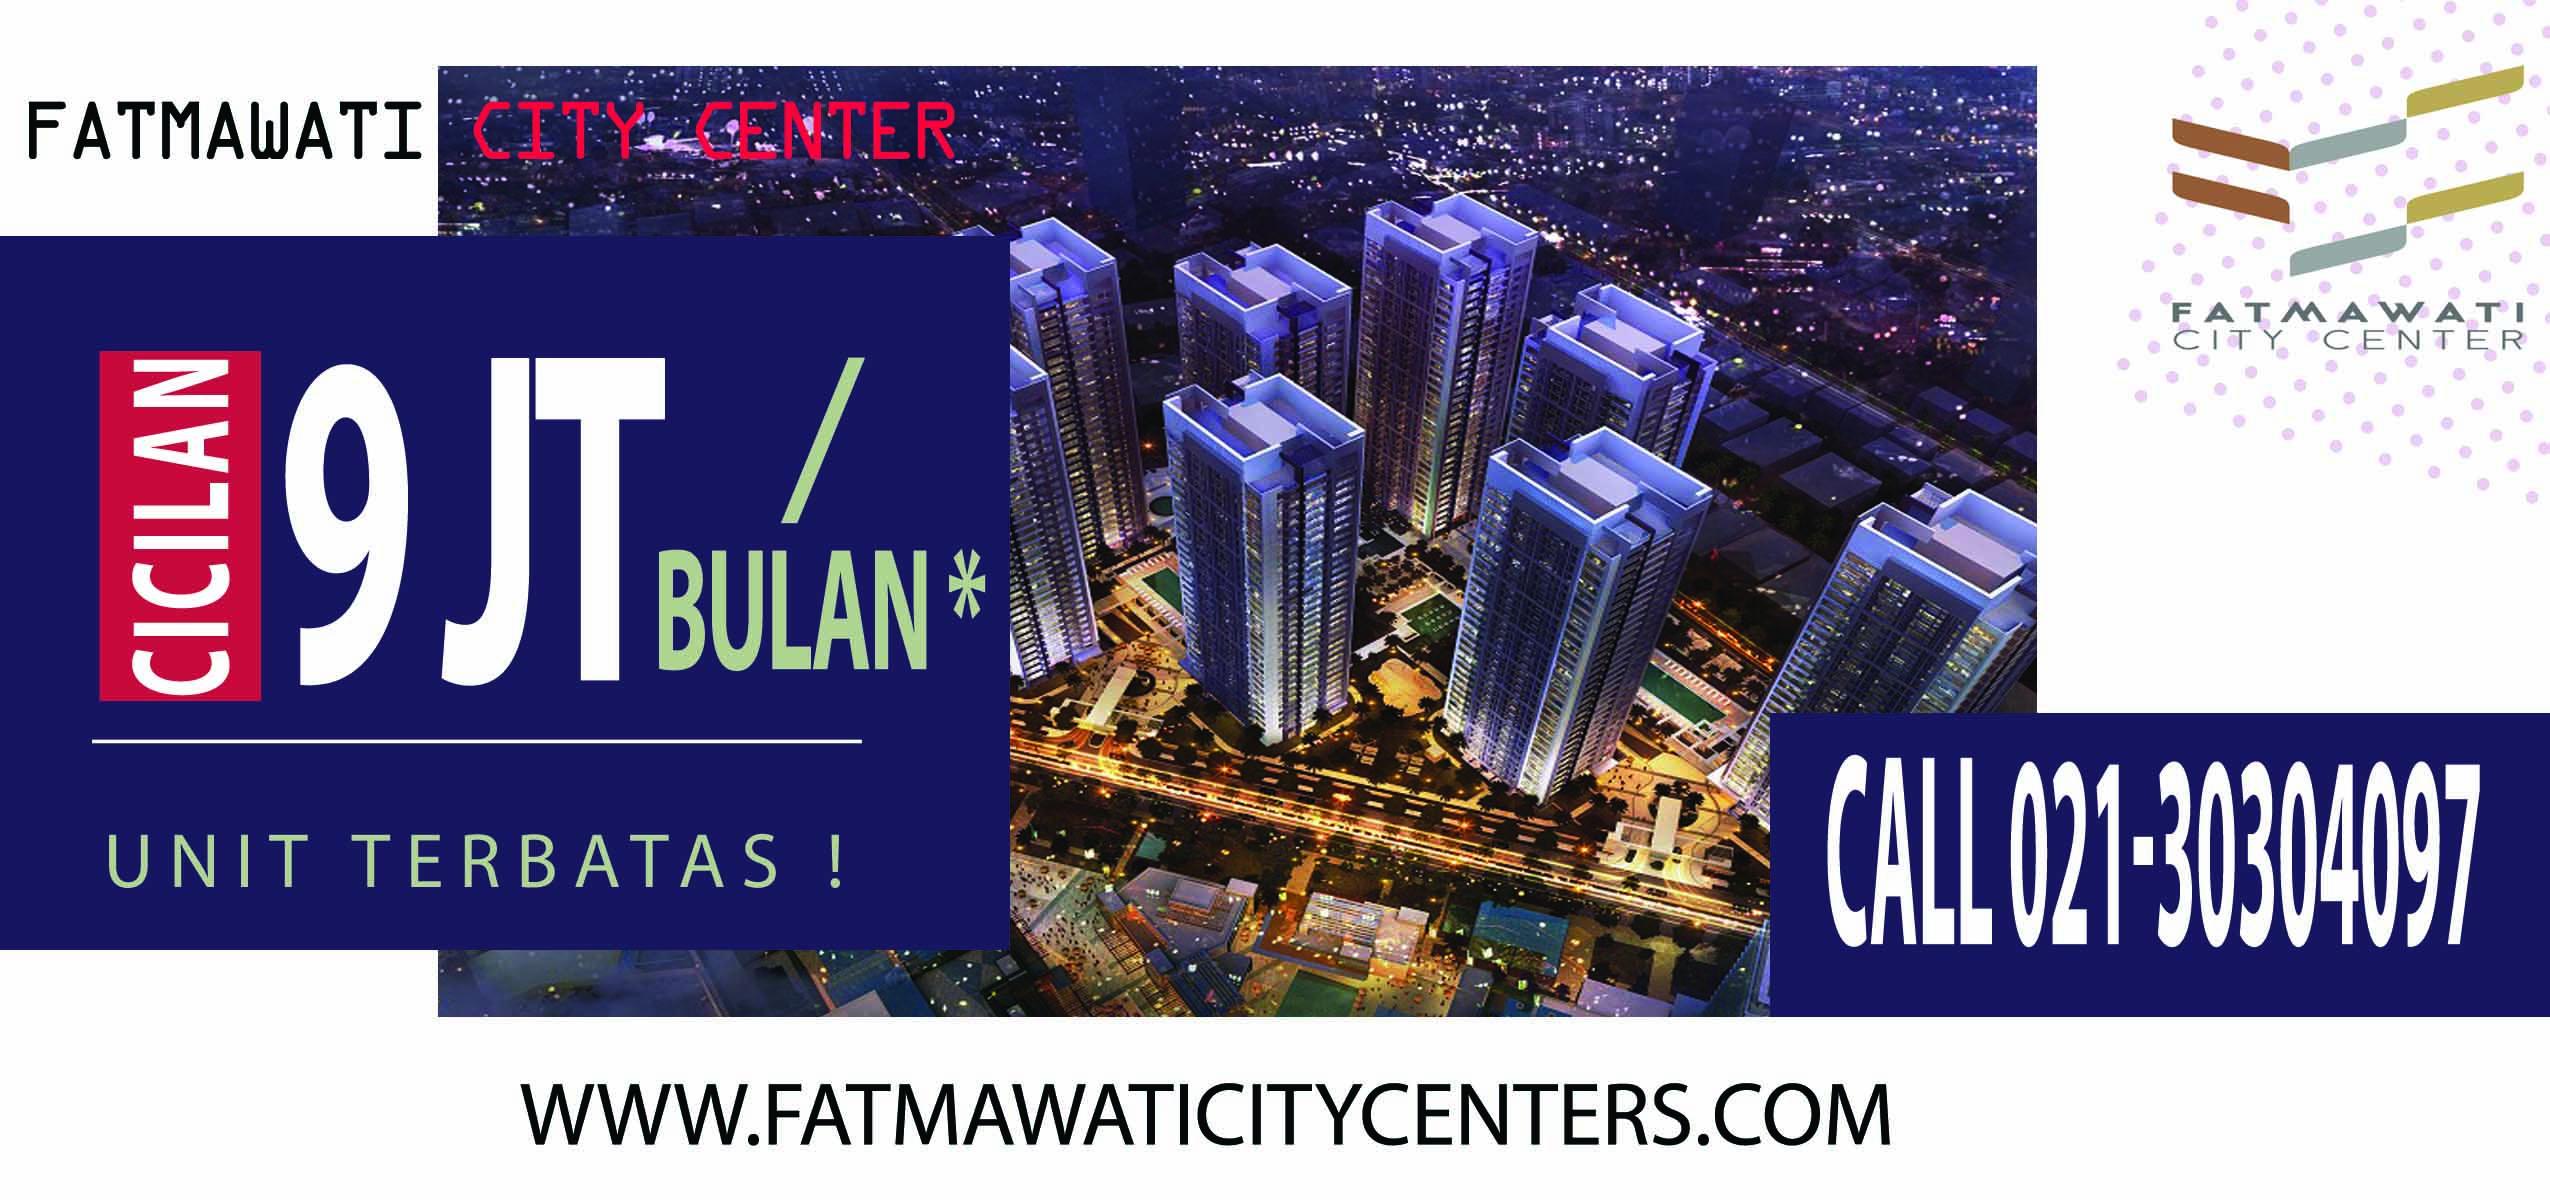 promo fatmawati city center